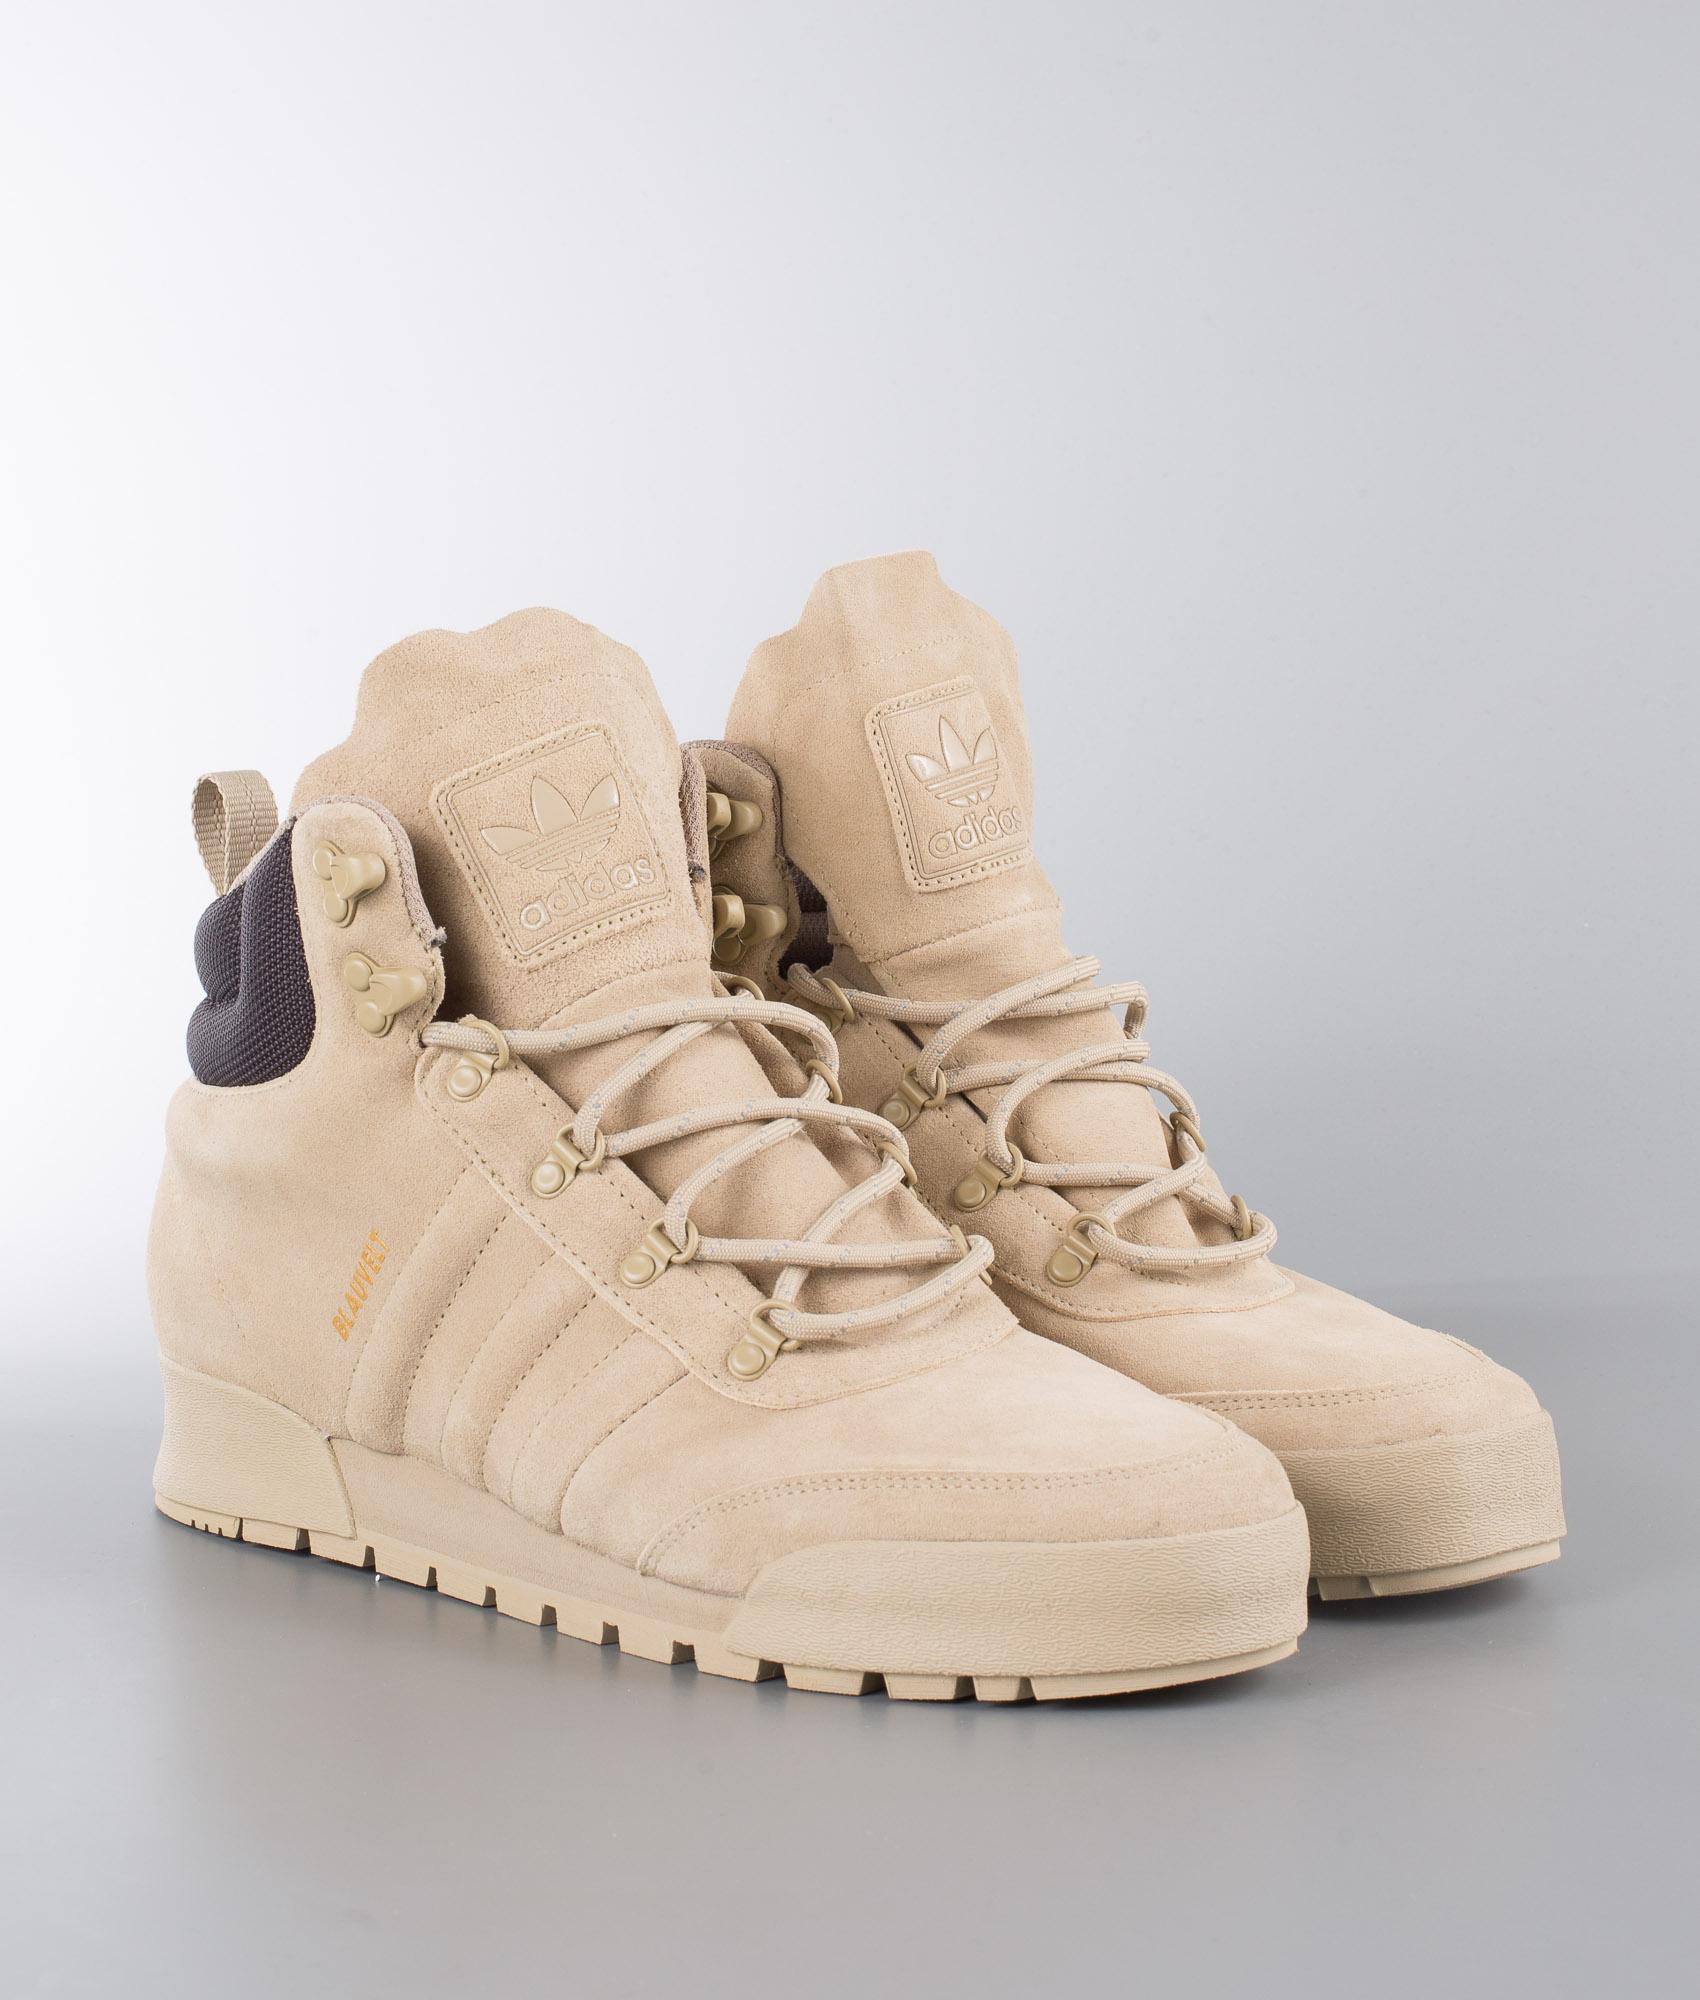 Boot Skateboarding Raw 2 0 Shoes Blackgoldmt Jake Adidas Goldcore qPxvEwOv